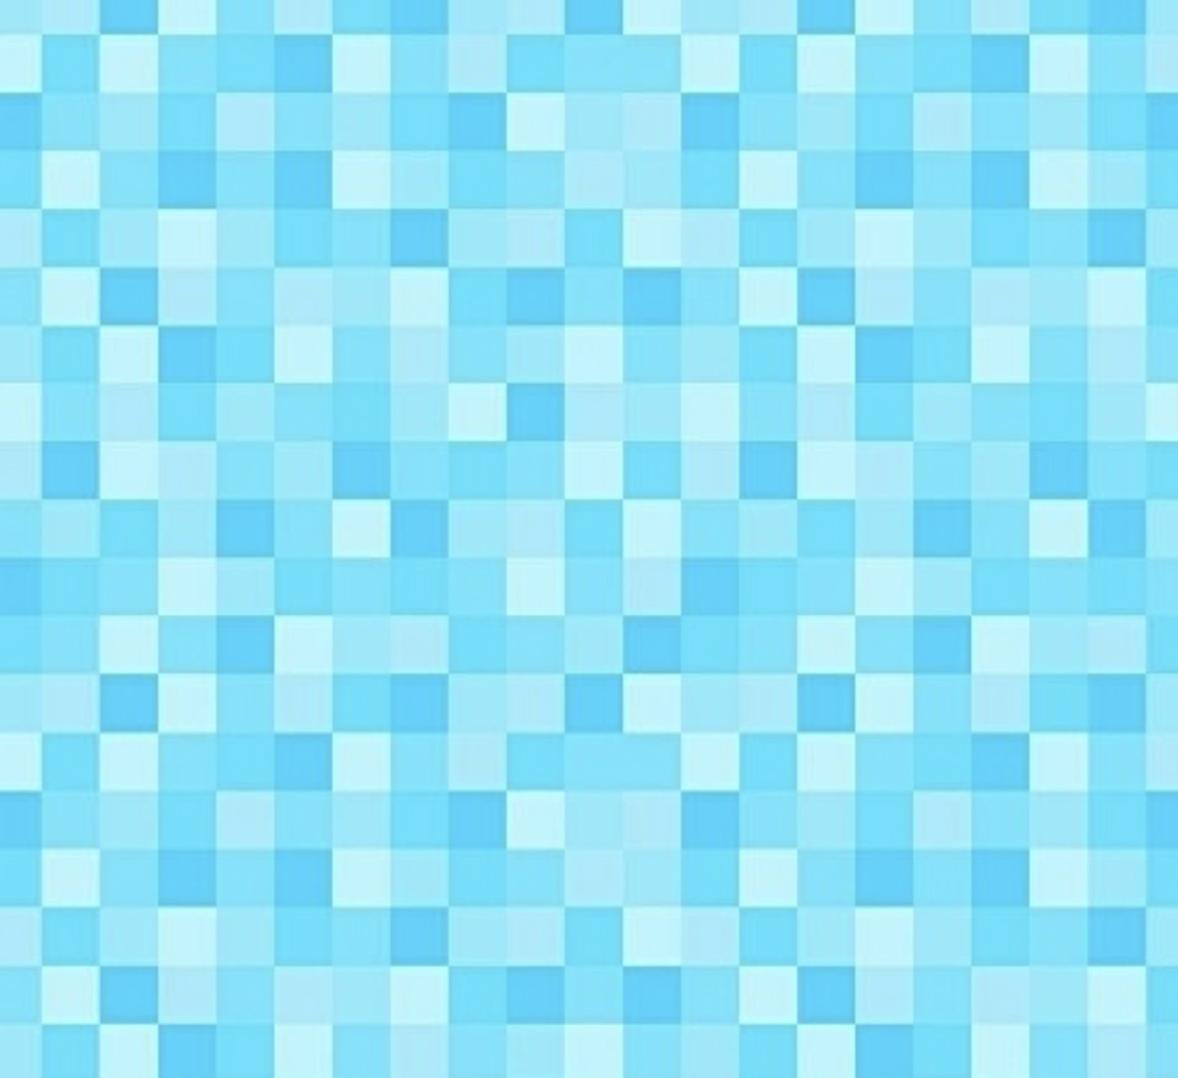 Blue Pixel - CUSTOM